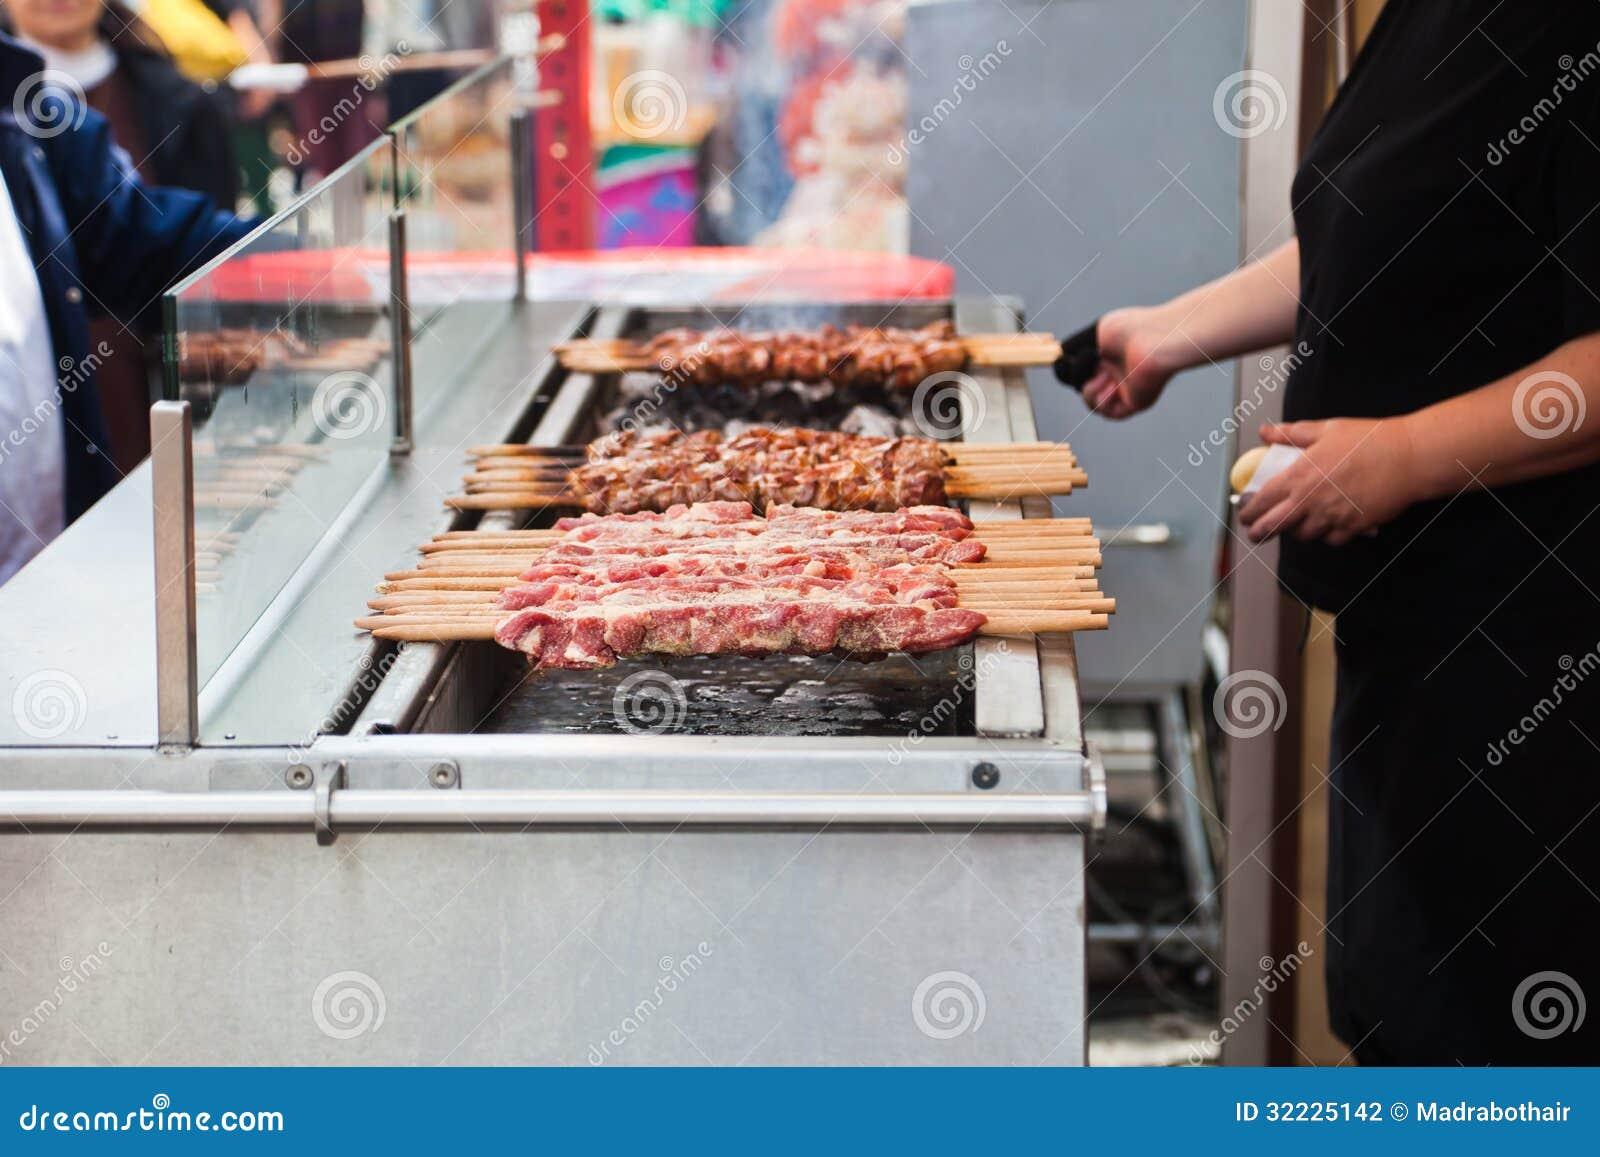 Download Grade foto de stock. Imagem de povos, barbecue, skewers - 32225142